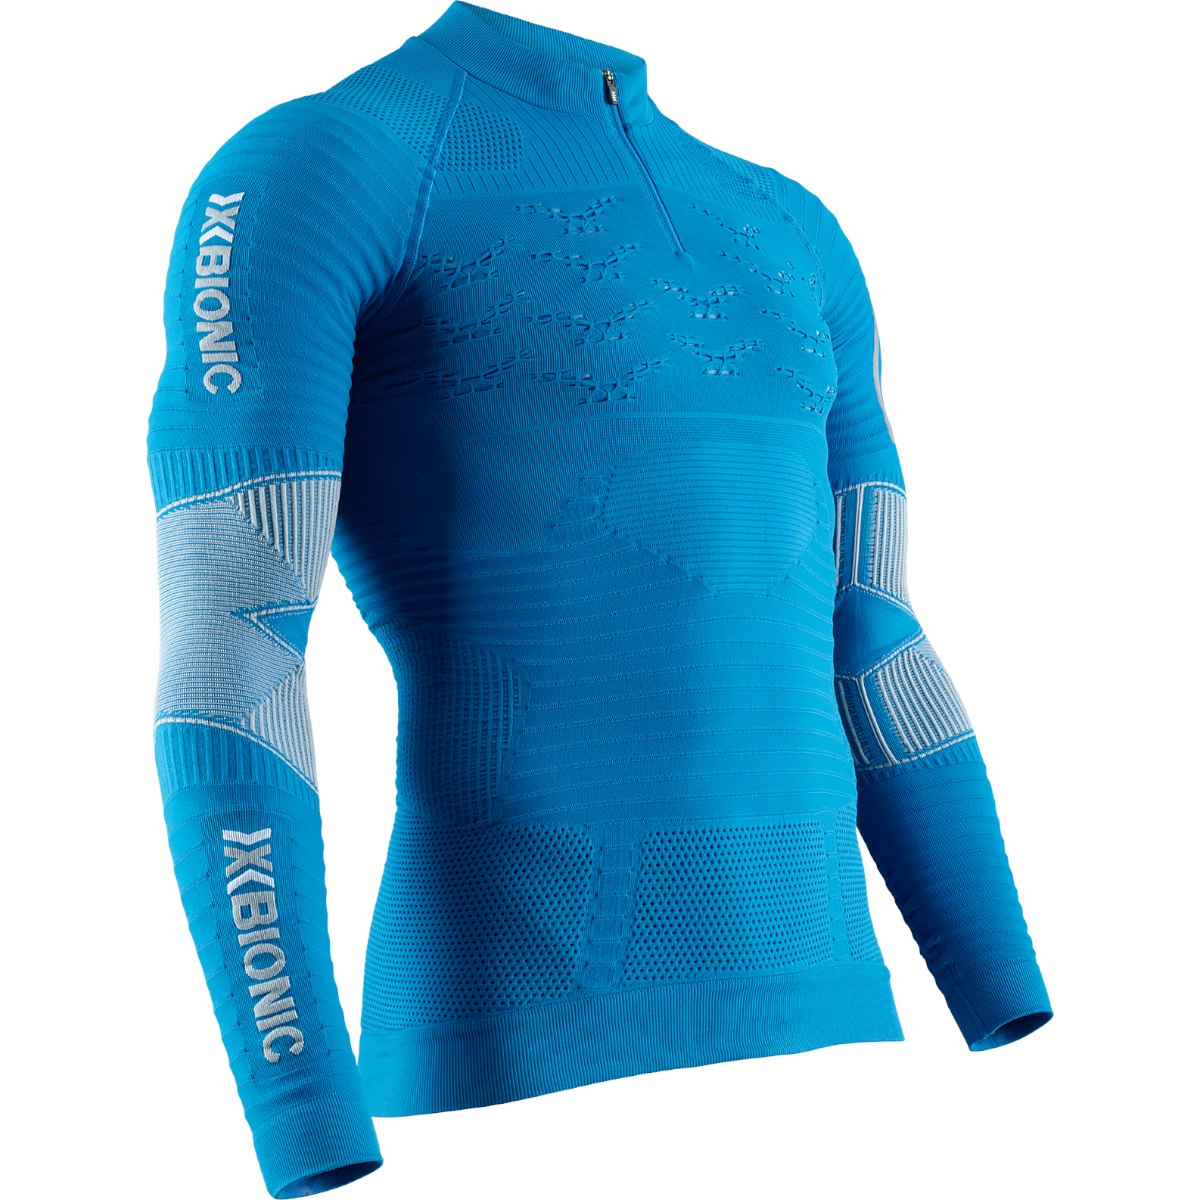 X-Bionic Effektor 4.0 Trail Run Powershirt 1/2 Zip Langarmshirt für Herren - teal blue/dolomite grey